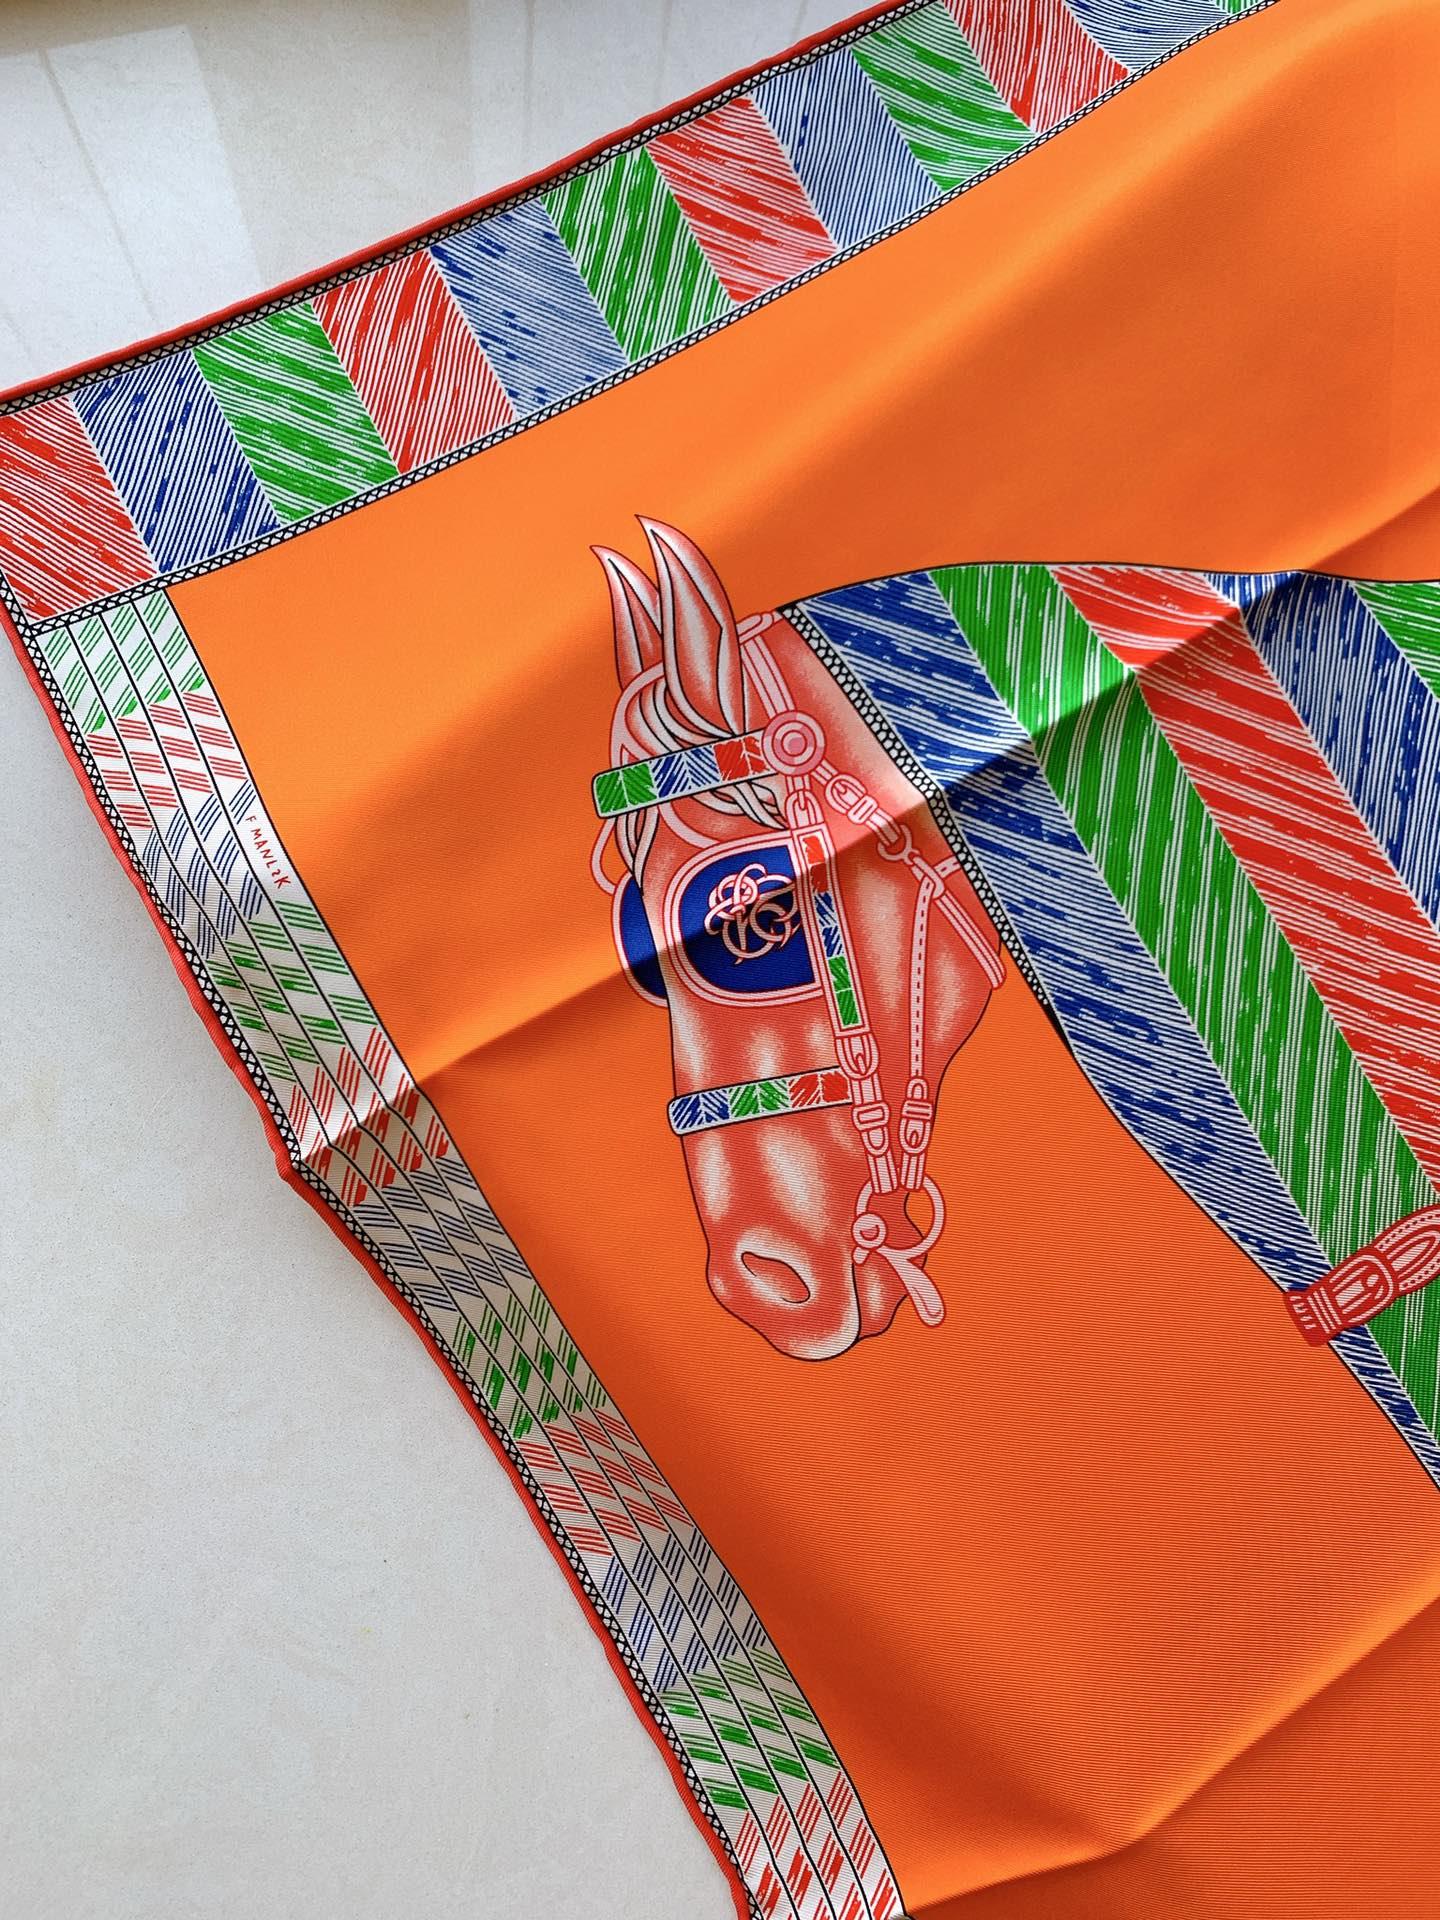 Hermes 新季度《骏马披挂》蚕丝方巾 《橙色》 20年新版骏马图案丝巾